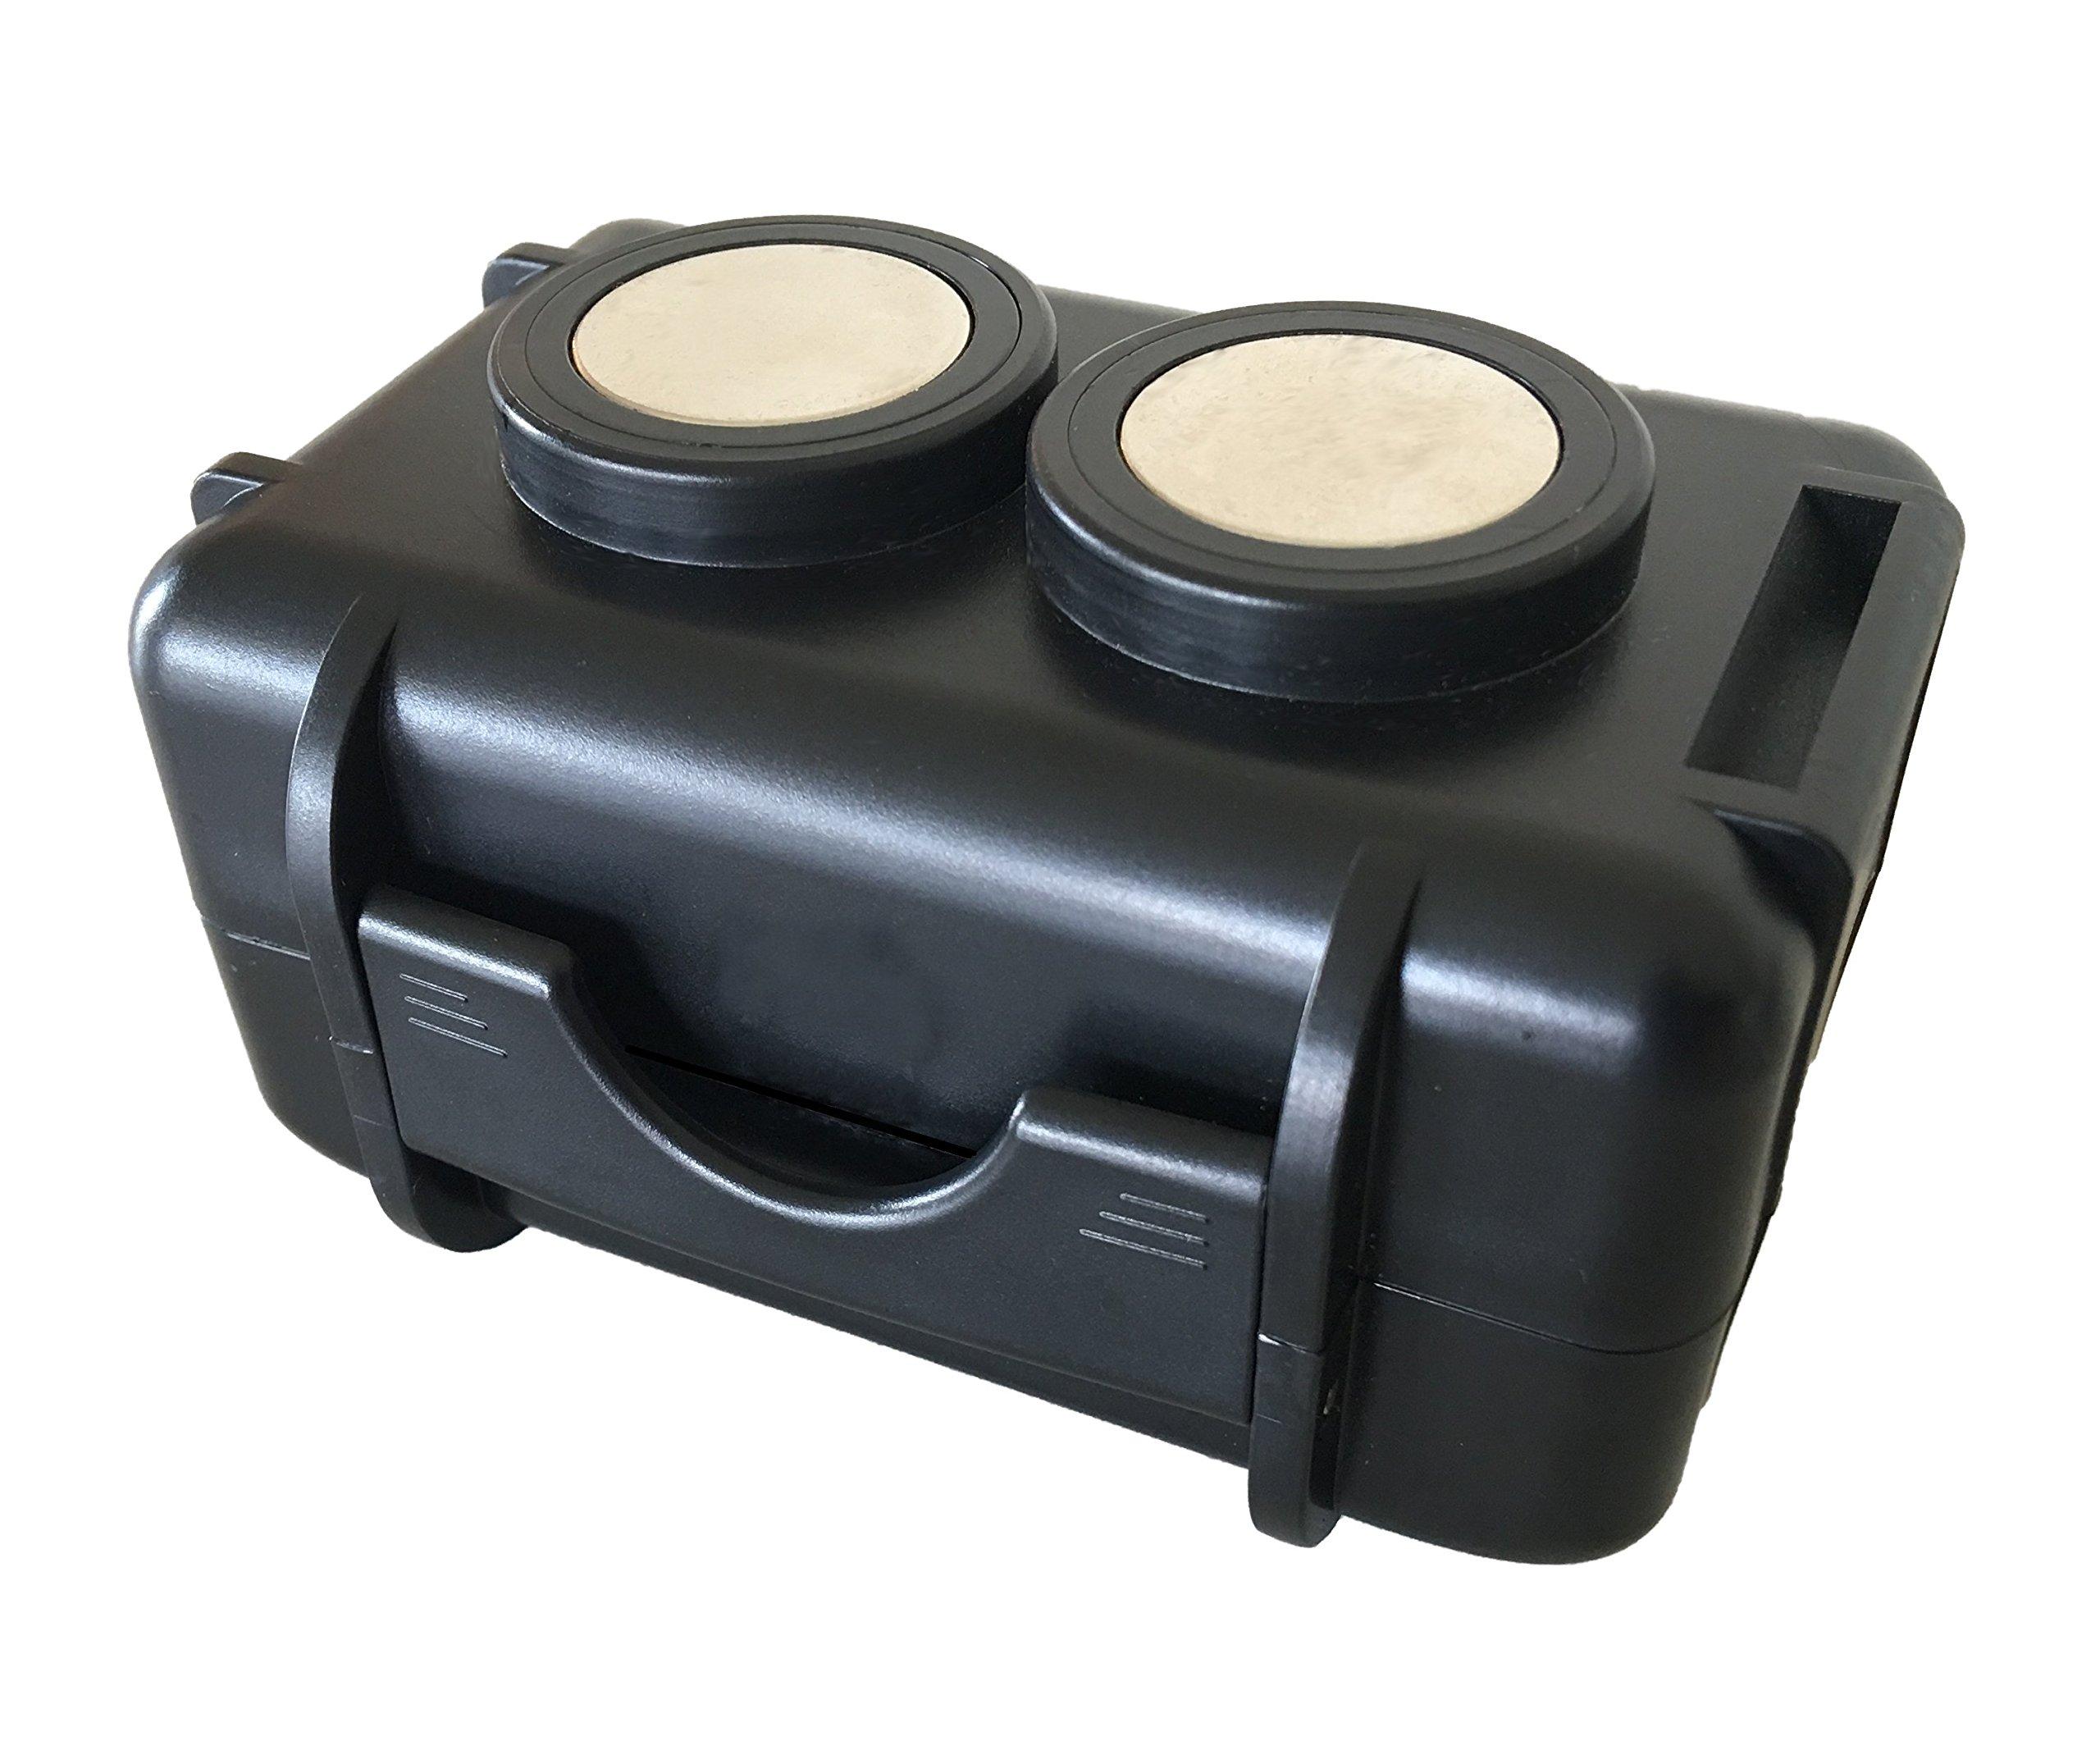 Optimus Twin Magnet GPS Tracker Case - Waterproof - Neodymium Magnets by Optimus Tracker